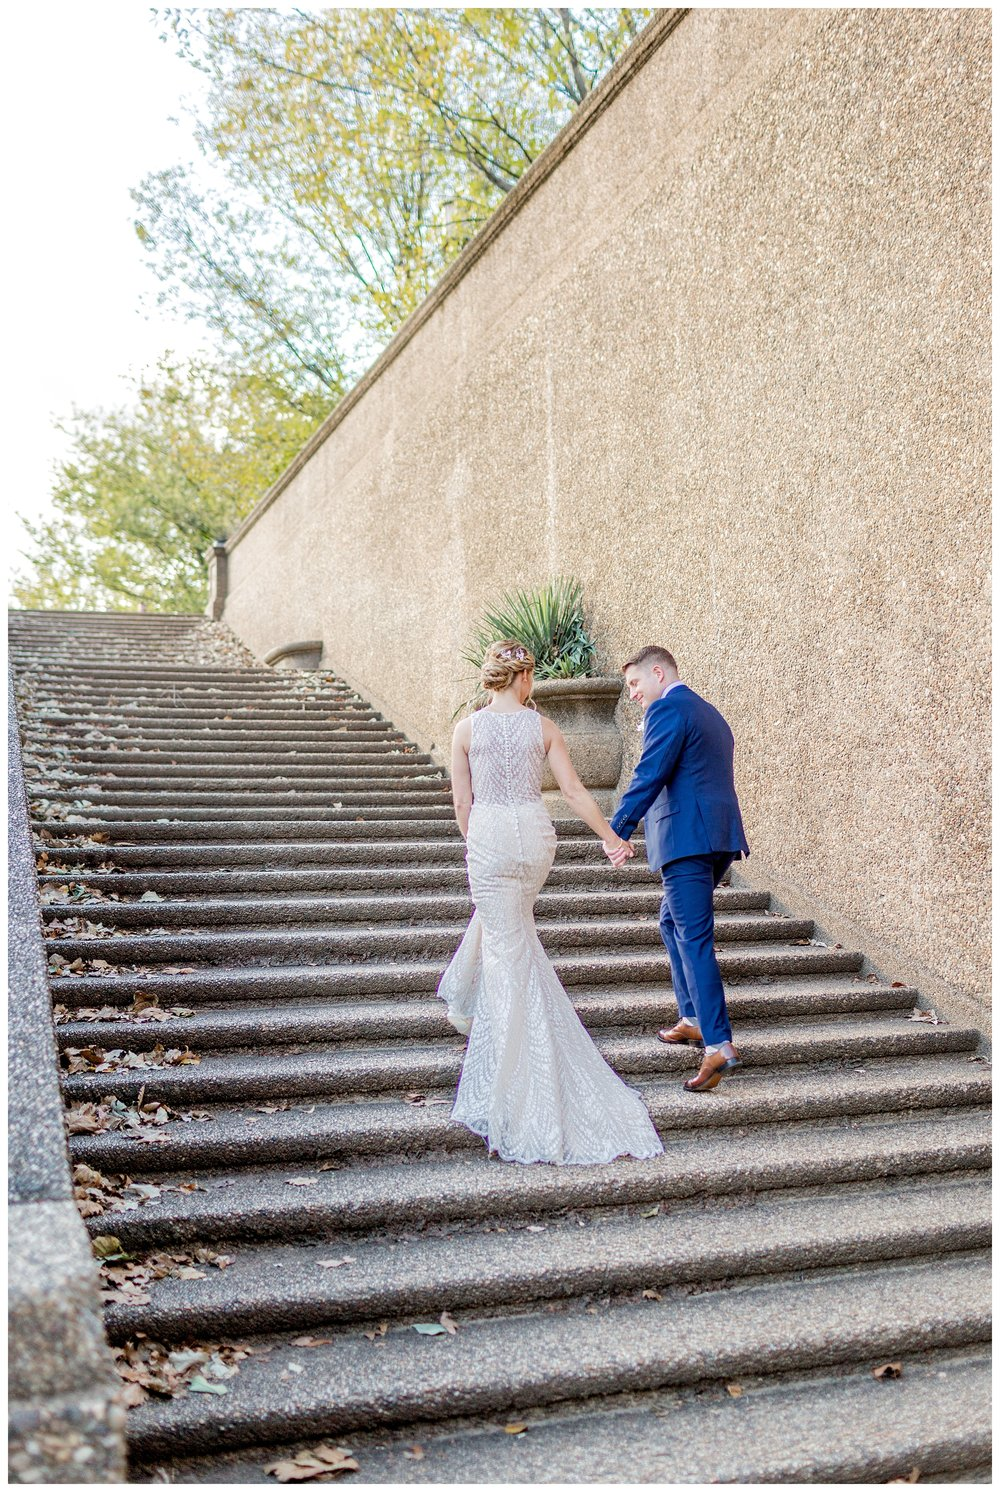 Meridian Hill Park Wedding | Washington DC Wedding Photographer Kir Tuben_0056.jpg